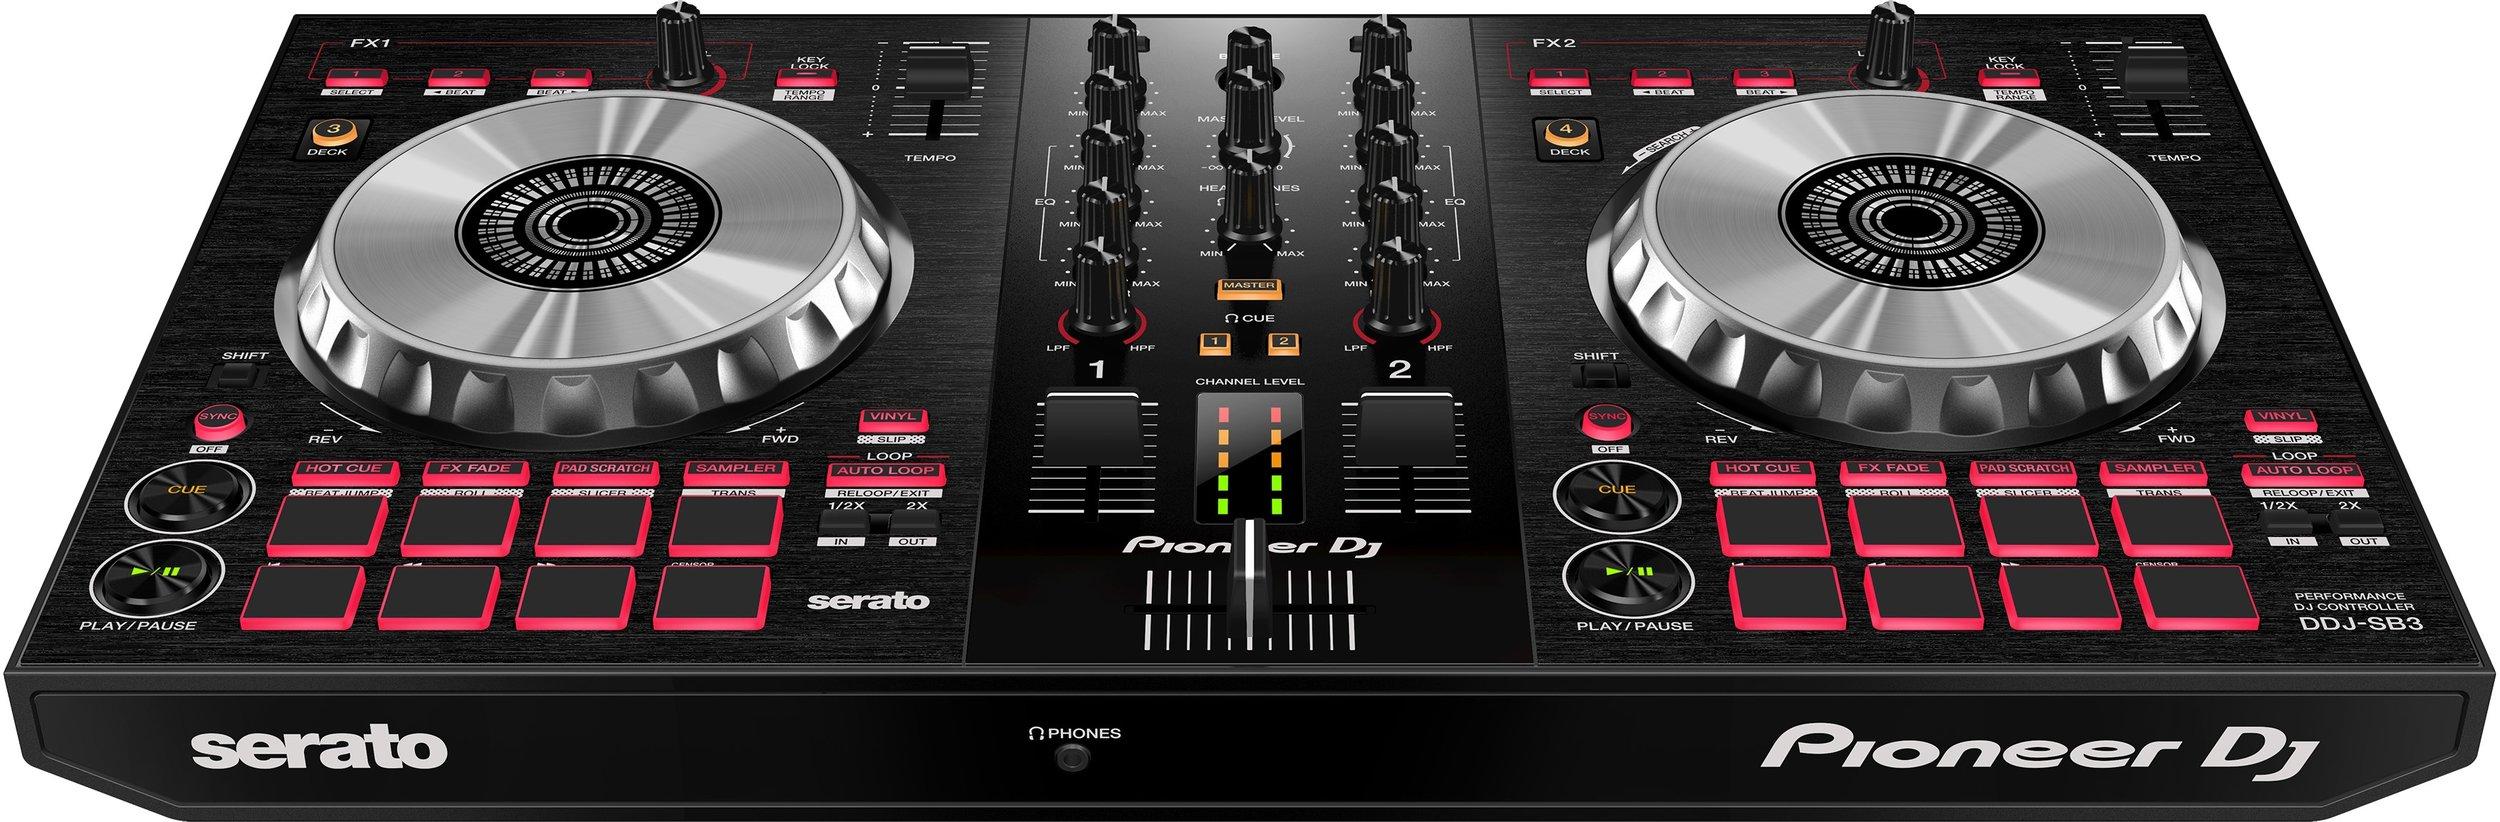 Pioneer DDJ-SB3 - £229 - Serato DJ Intro